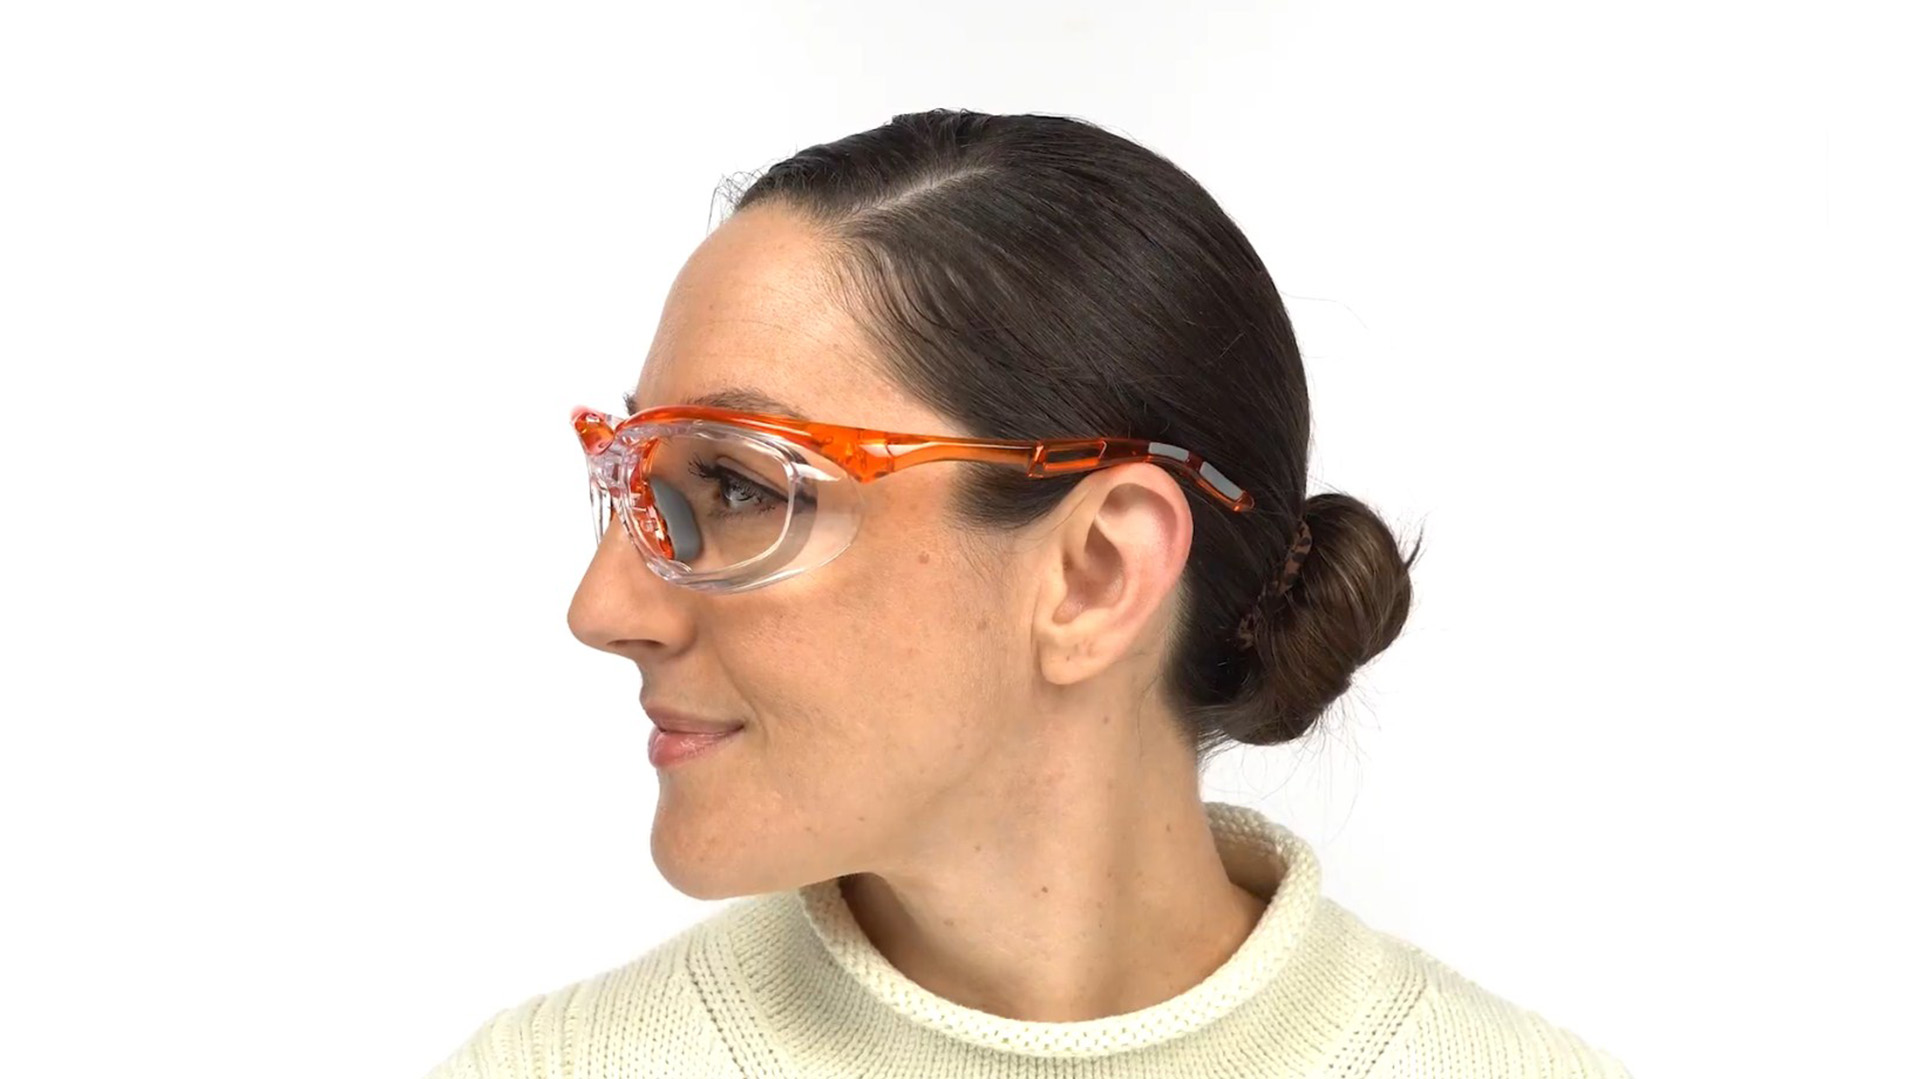 Fusion Toledo  Prescription Safety Glasses Orange - ANSI Z87.1 Certified Stamped